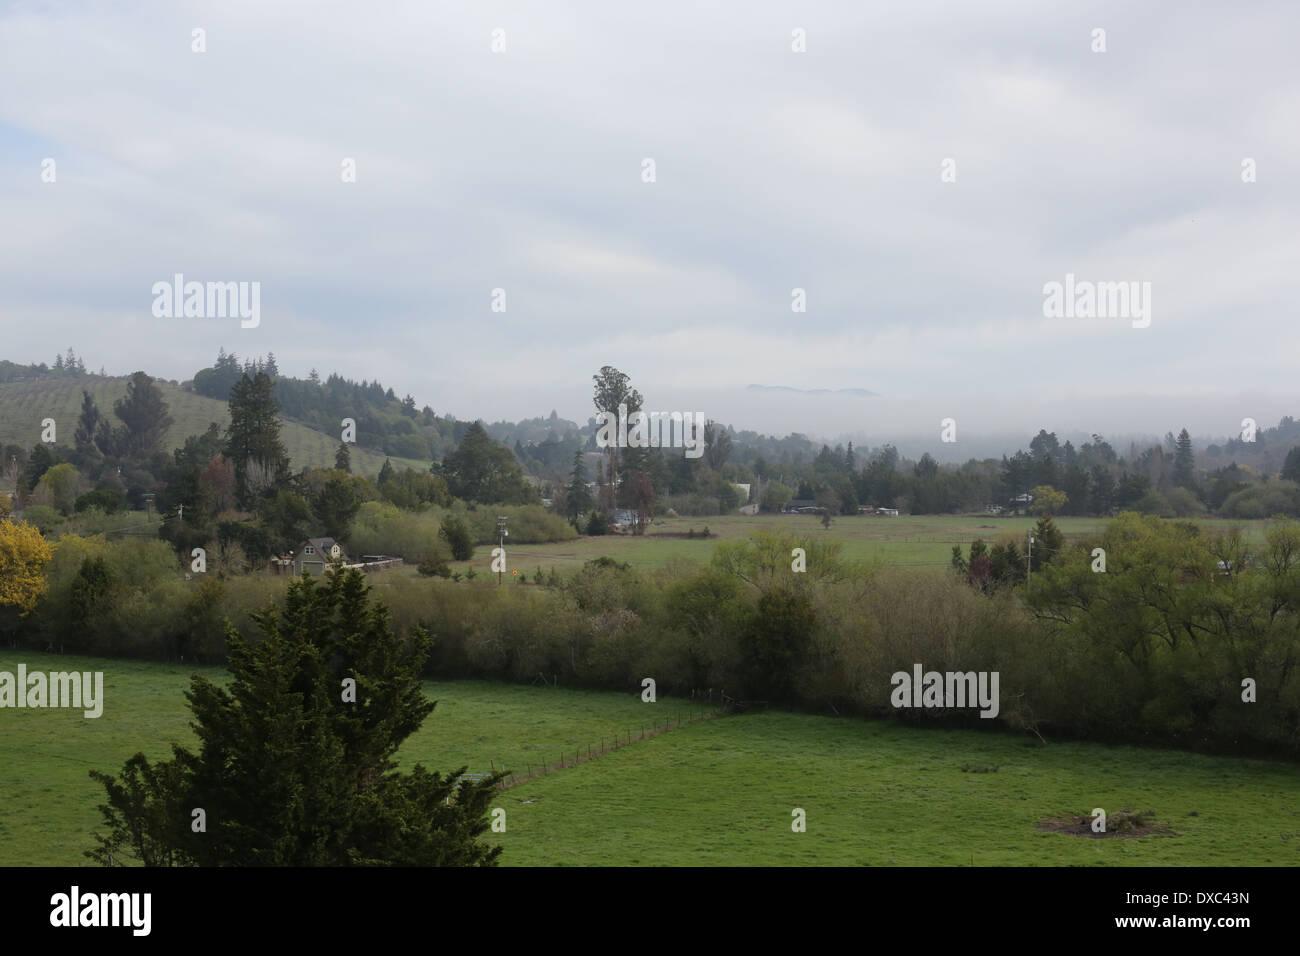 A view toward Mount St. Helena from Sebastopol, California. - Stock Image